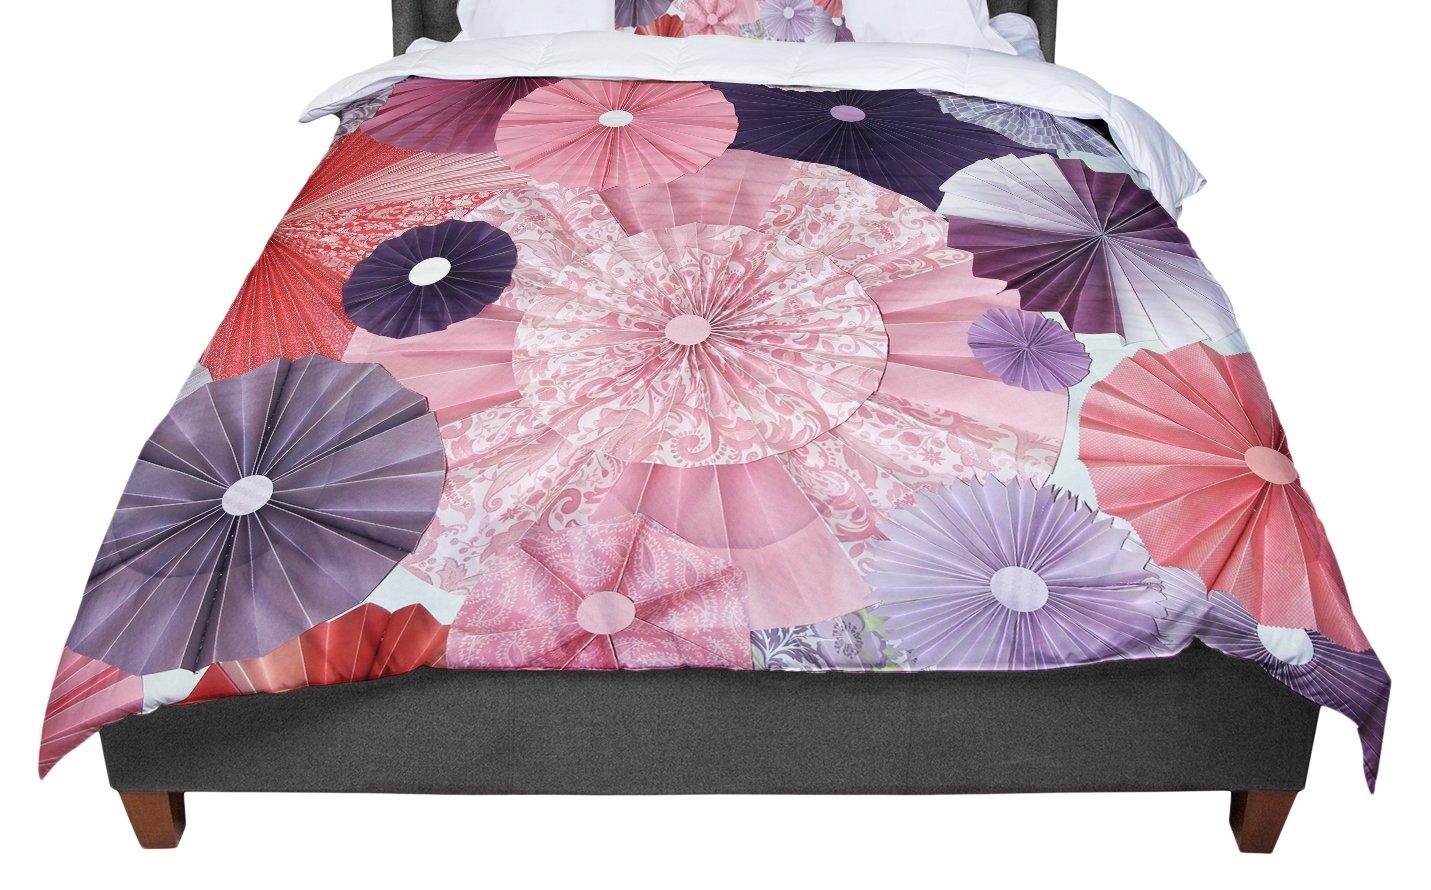 KESS InHouse Heidi Jennings The Royal Court Pink Purple Twin Comforter 68 X 88